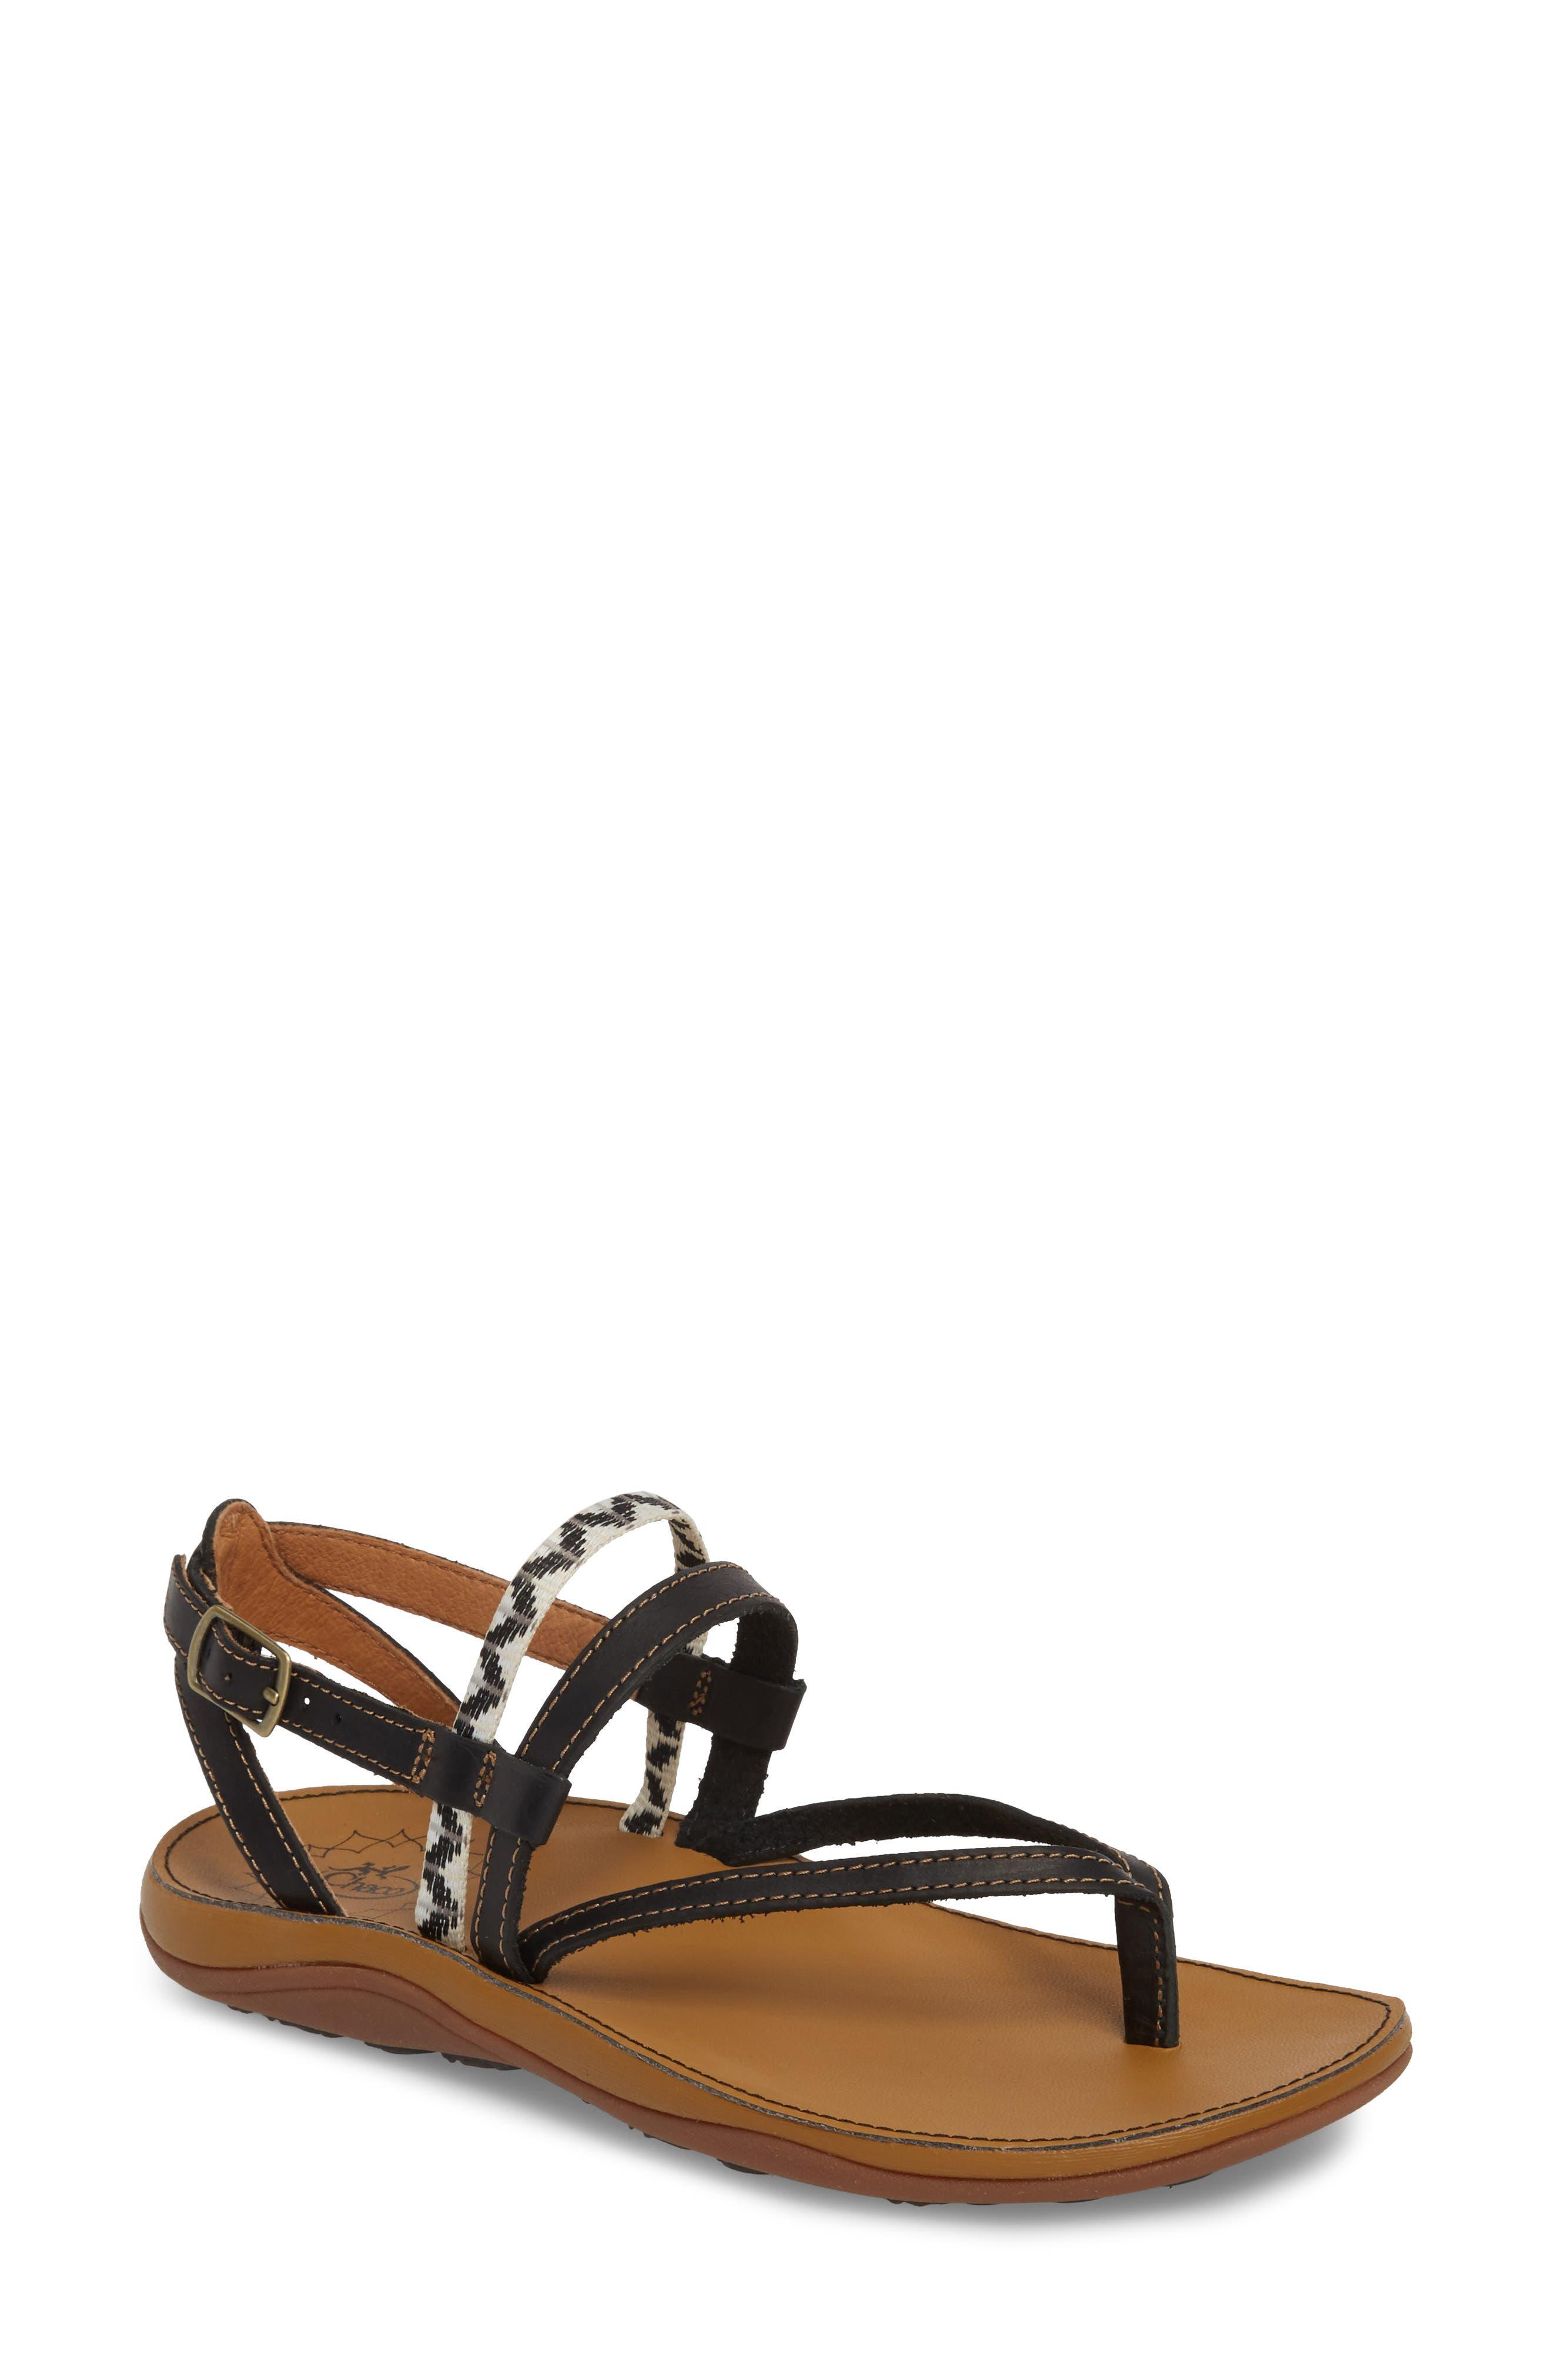 Loveland Sandal,                         Main,                         color, DOLMAN BLACK